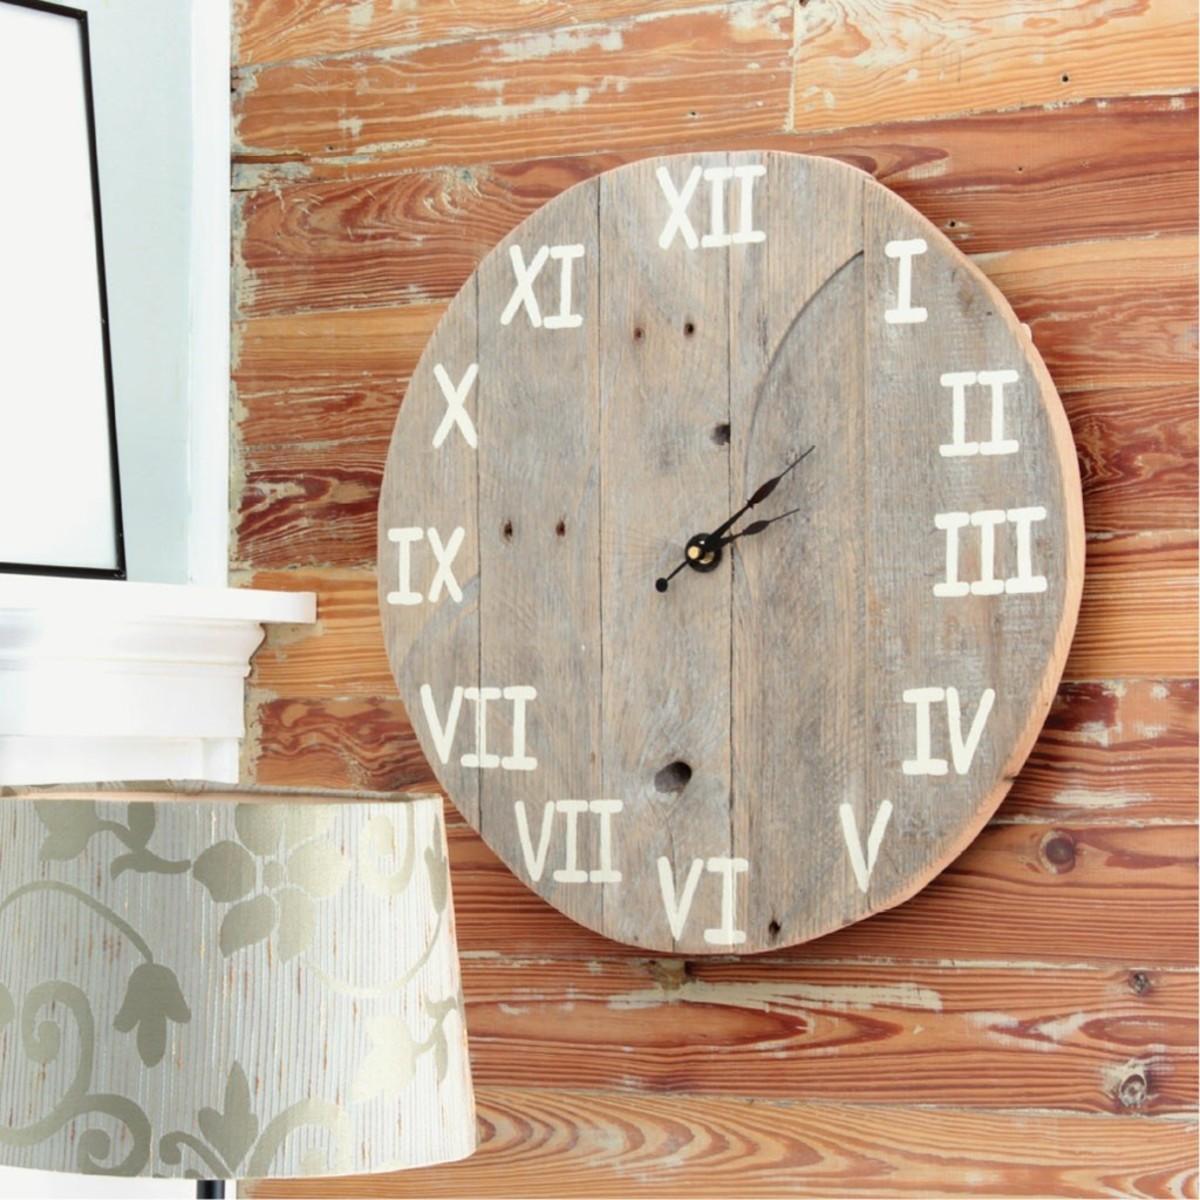 guerilla-furniture-design-rustic-wooden-clock-diy-projects